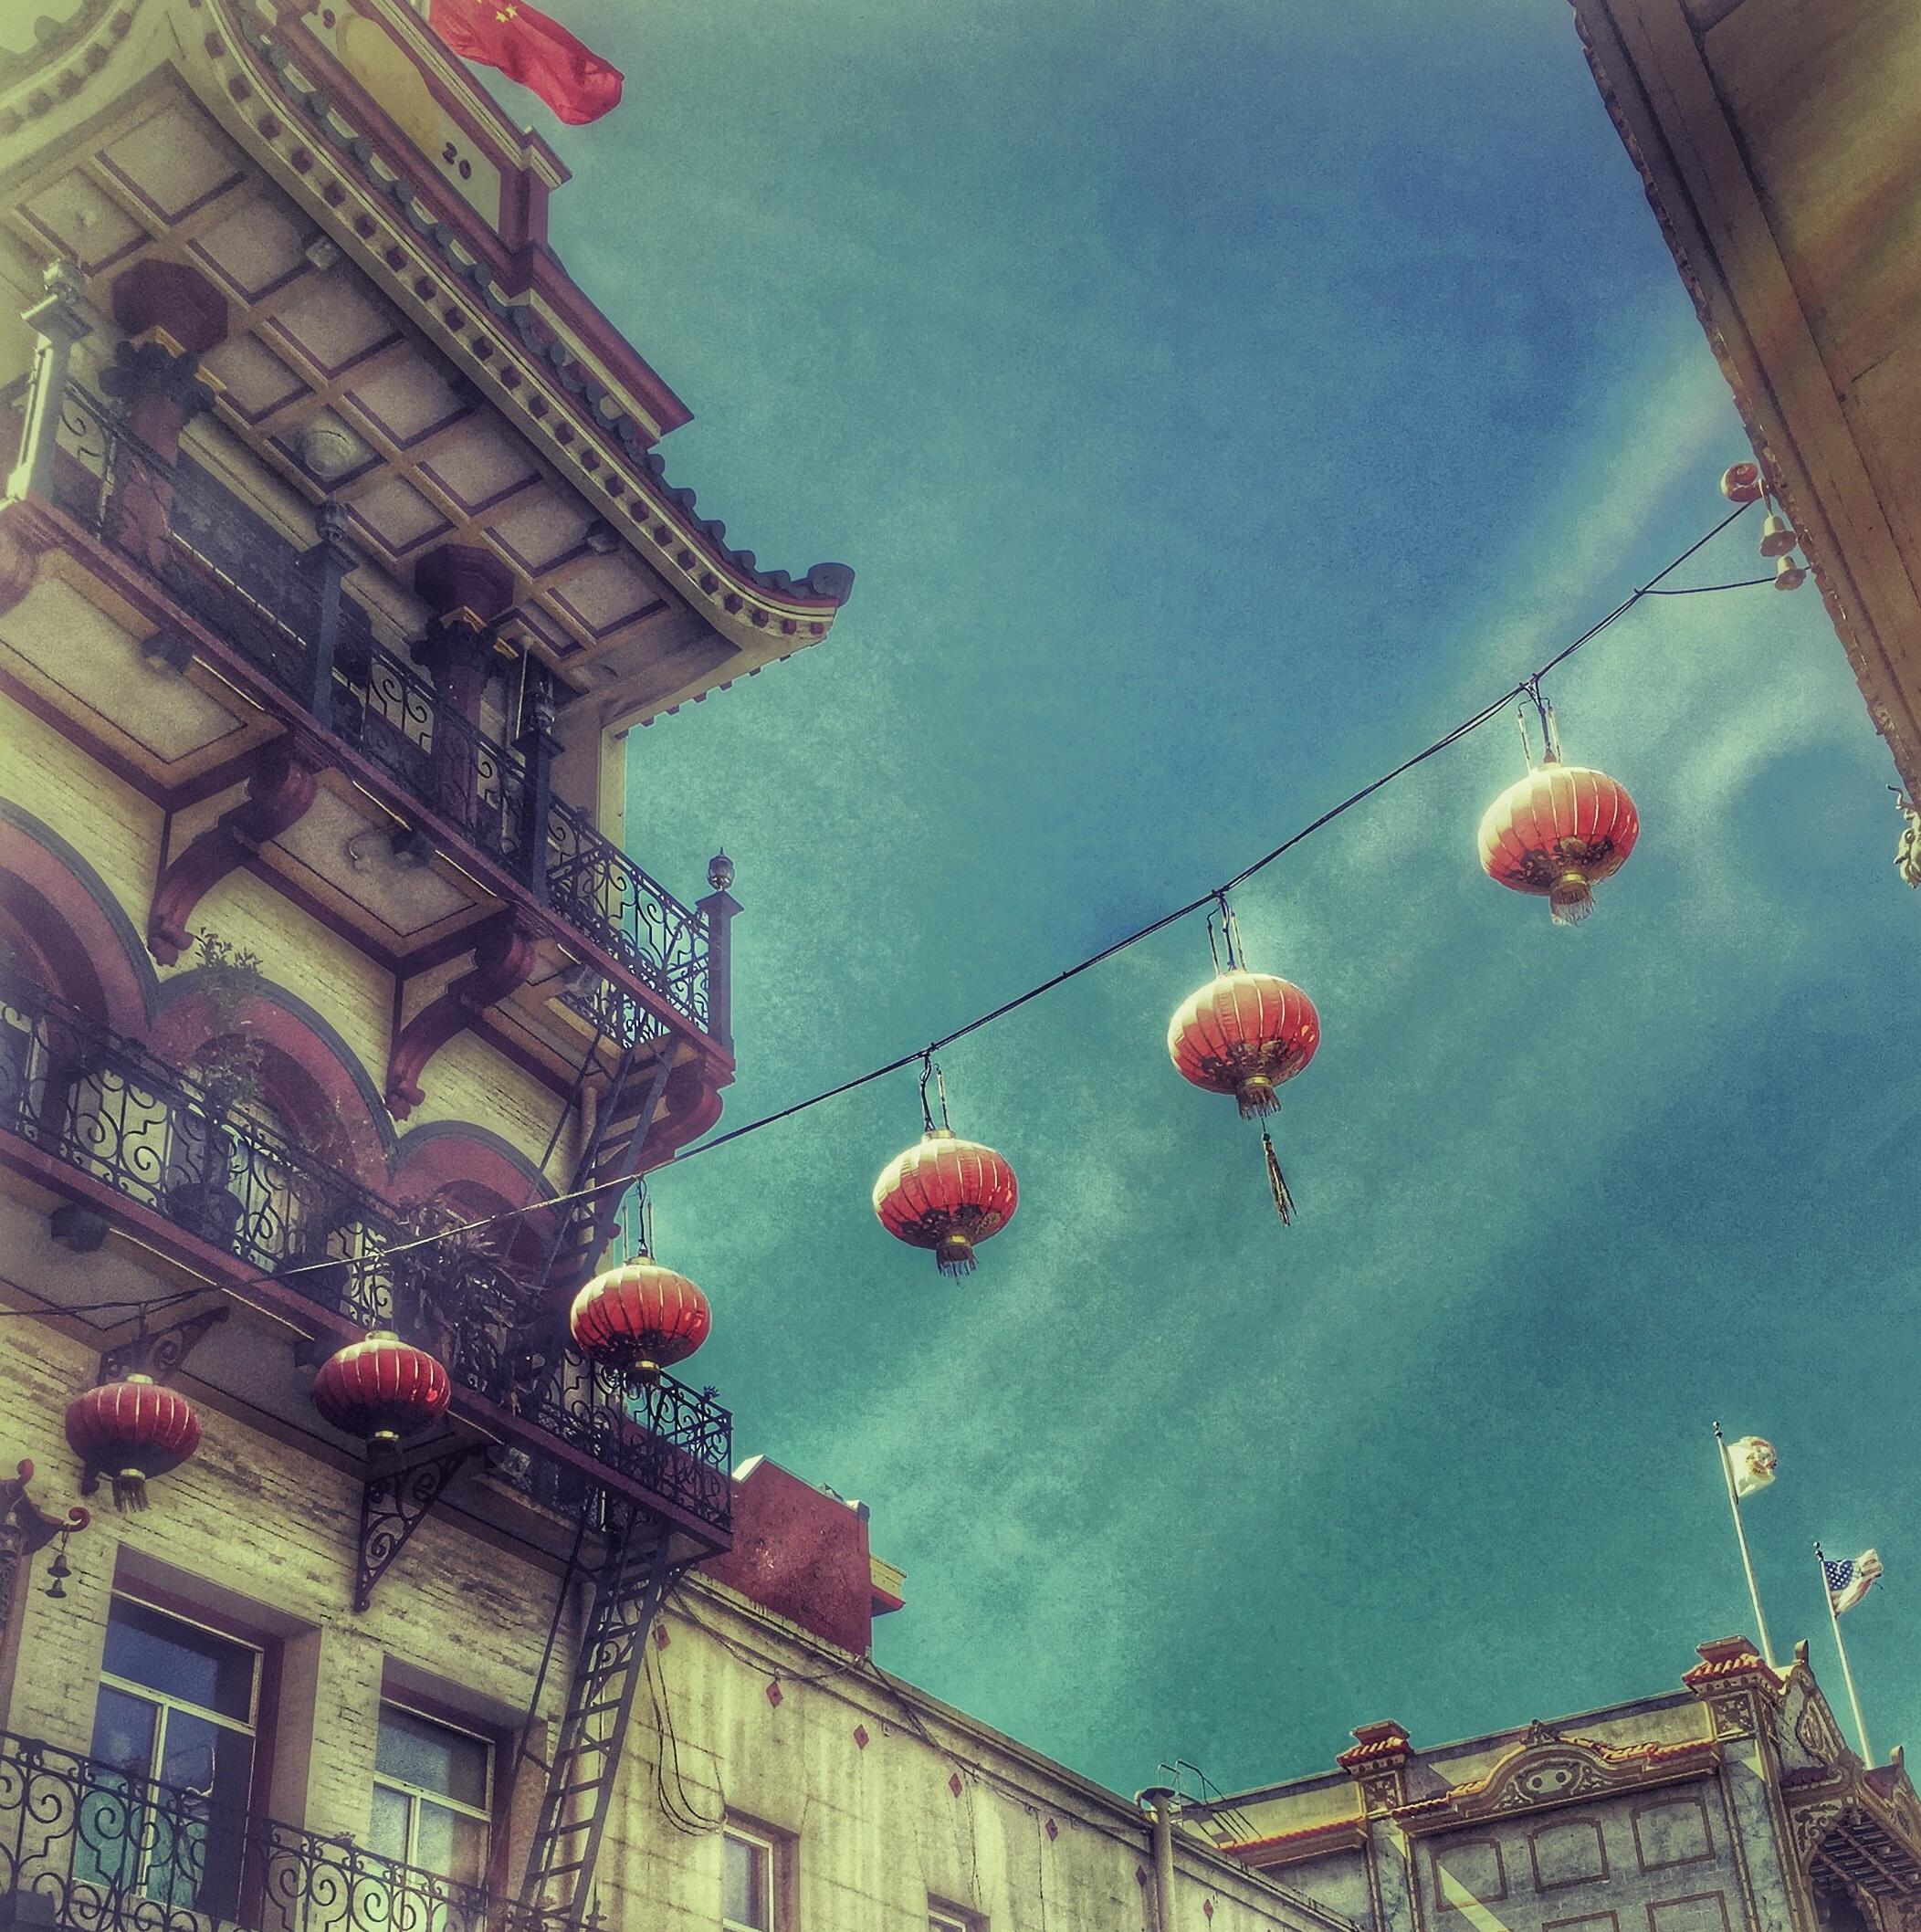 Lantern | China Town, San Francisco | 2013